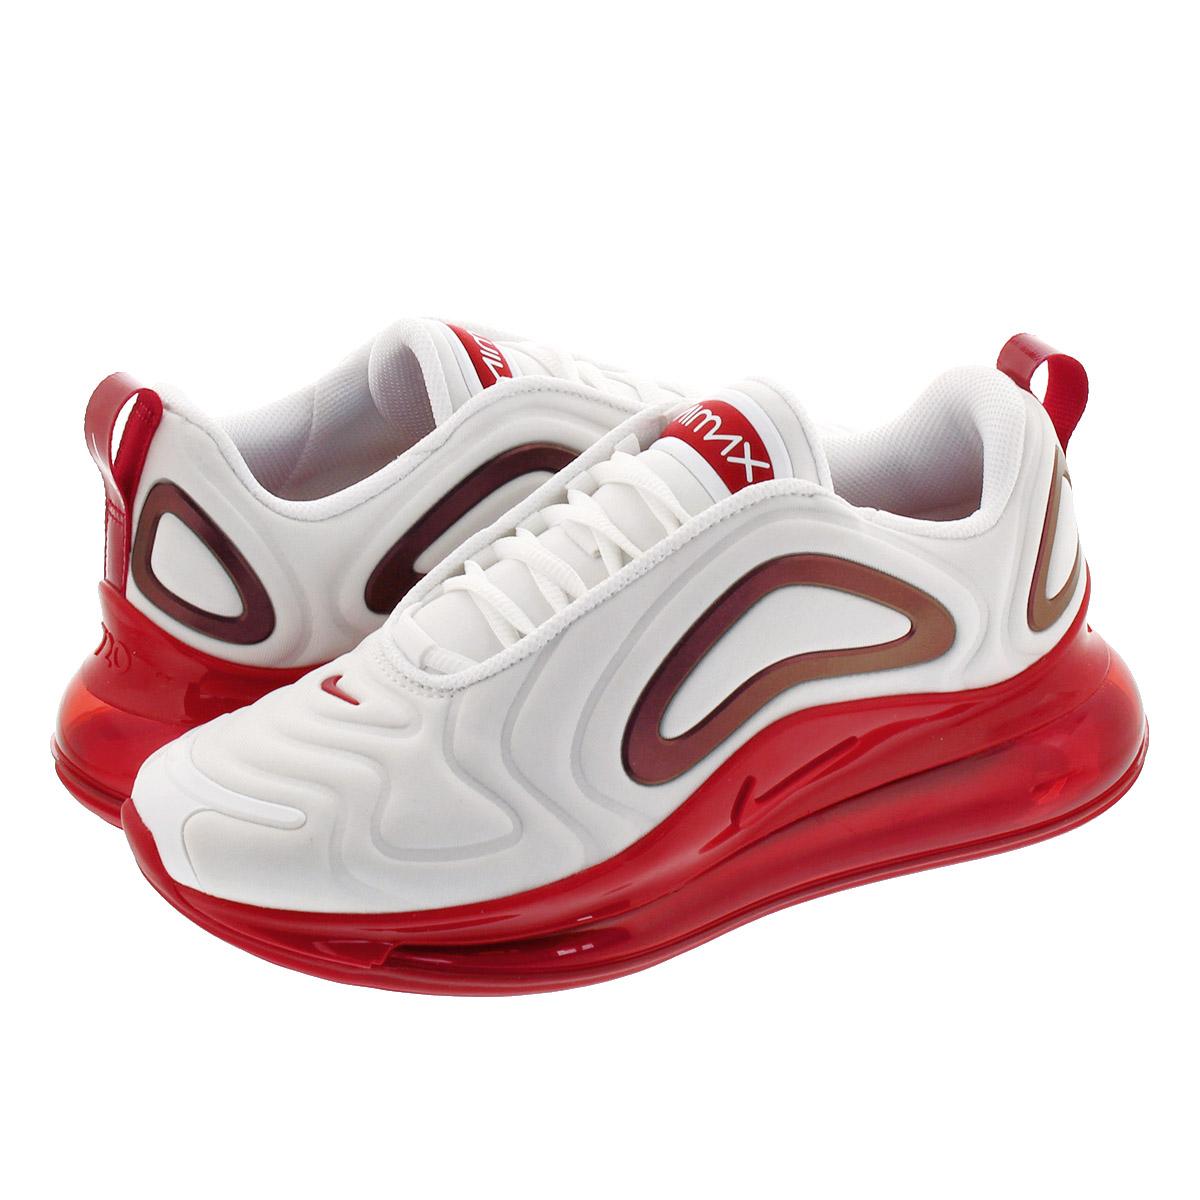 nike air max 720 white gym red